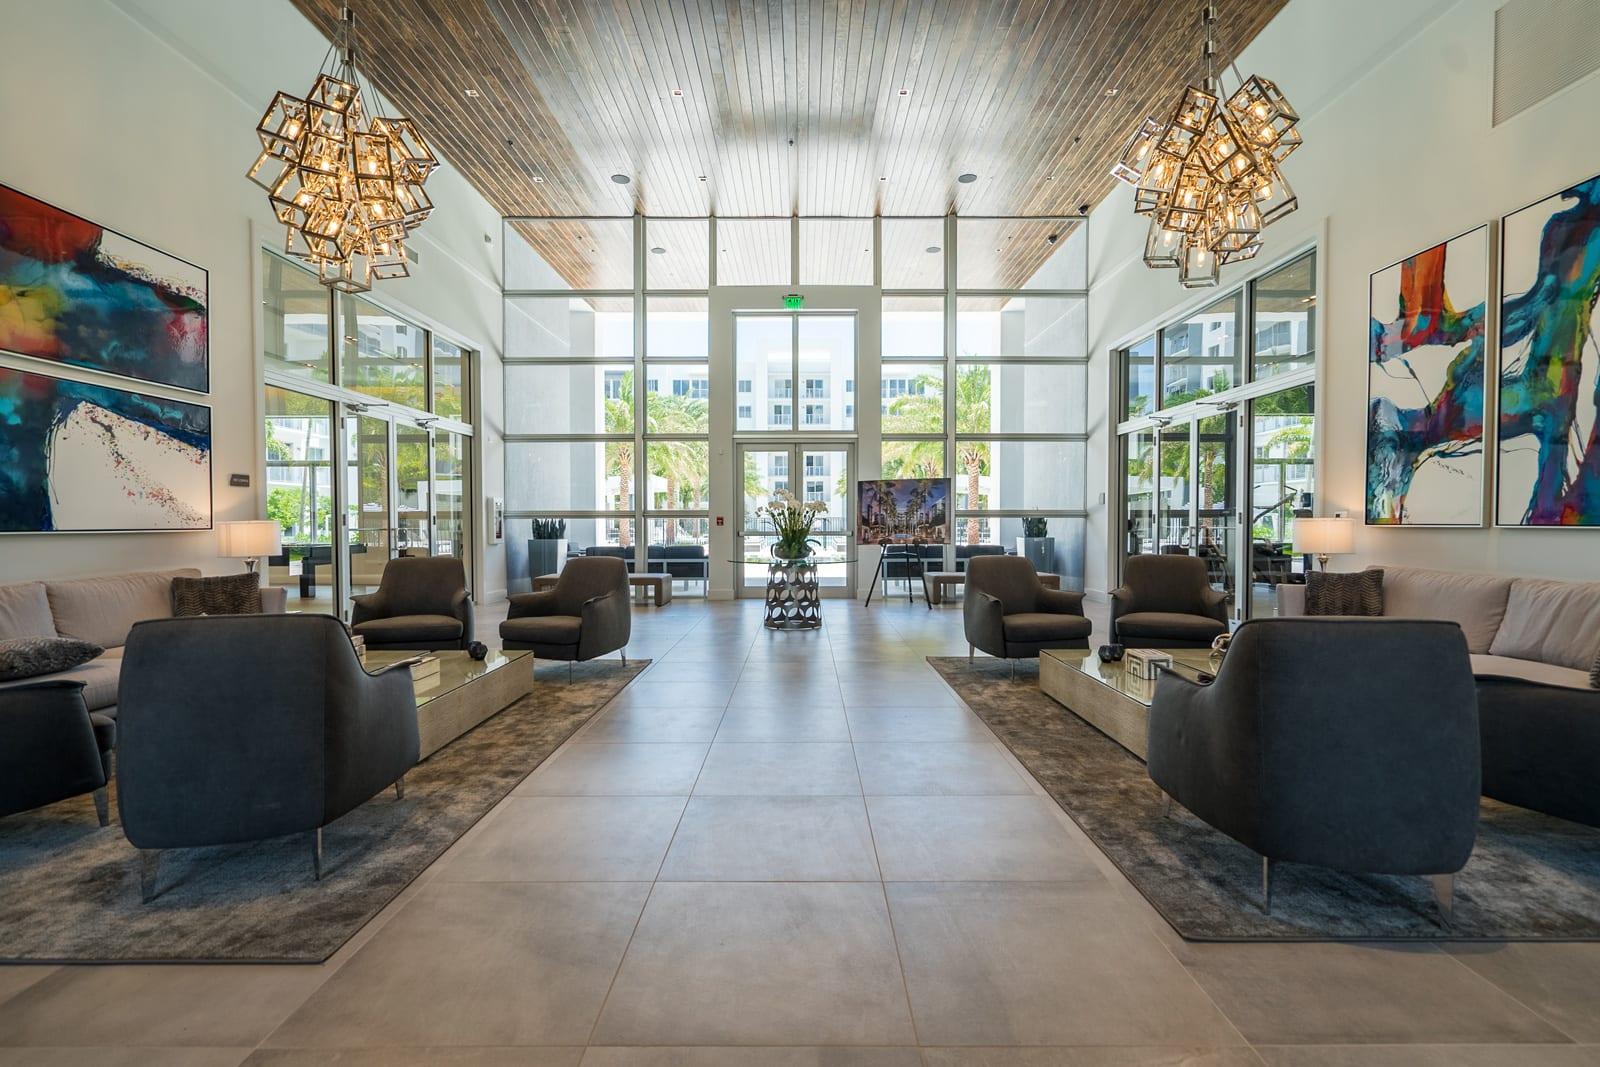 Atrium-Style Lobby at Allure by Windsor, Boca Raton, 33487